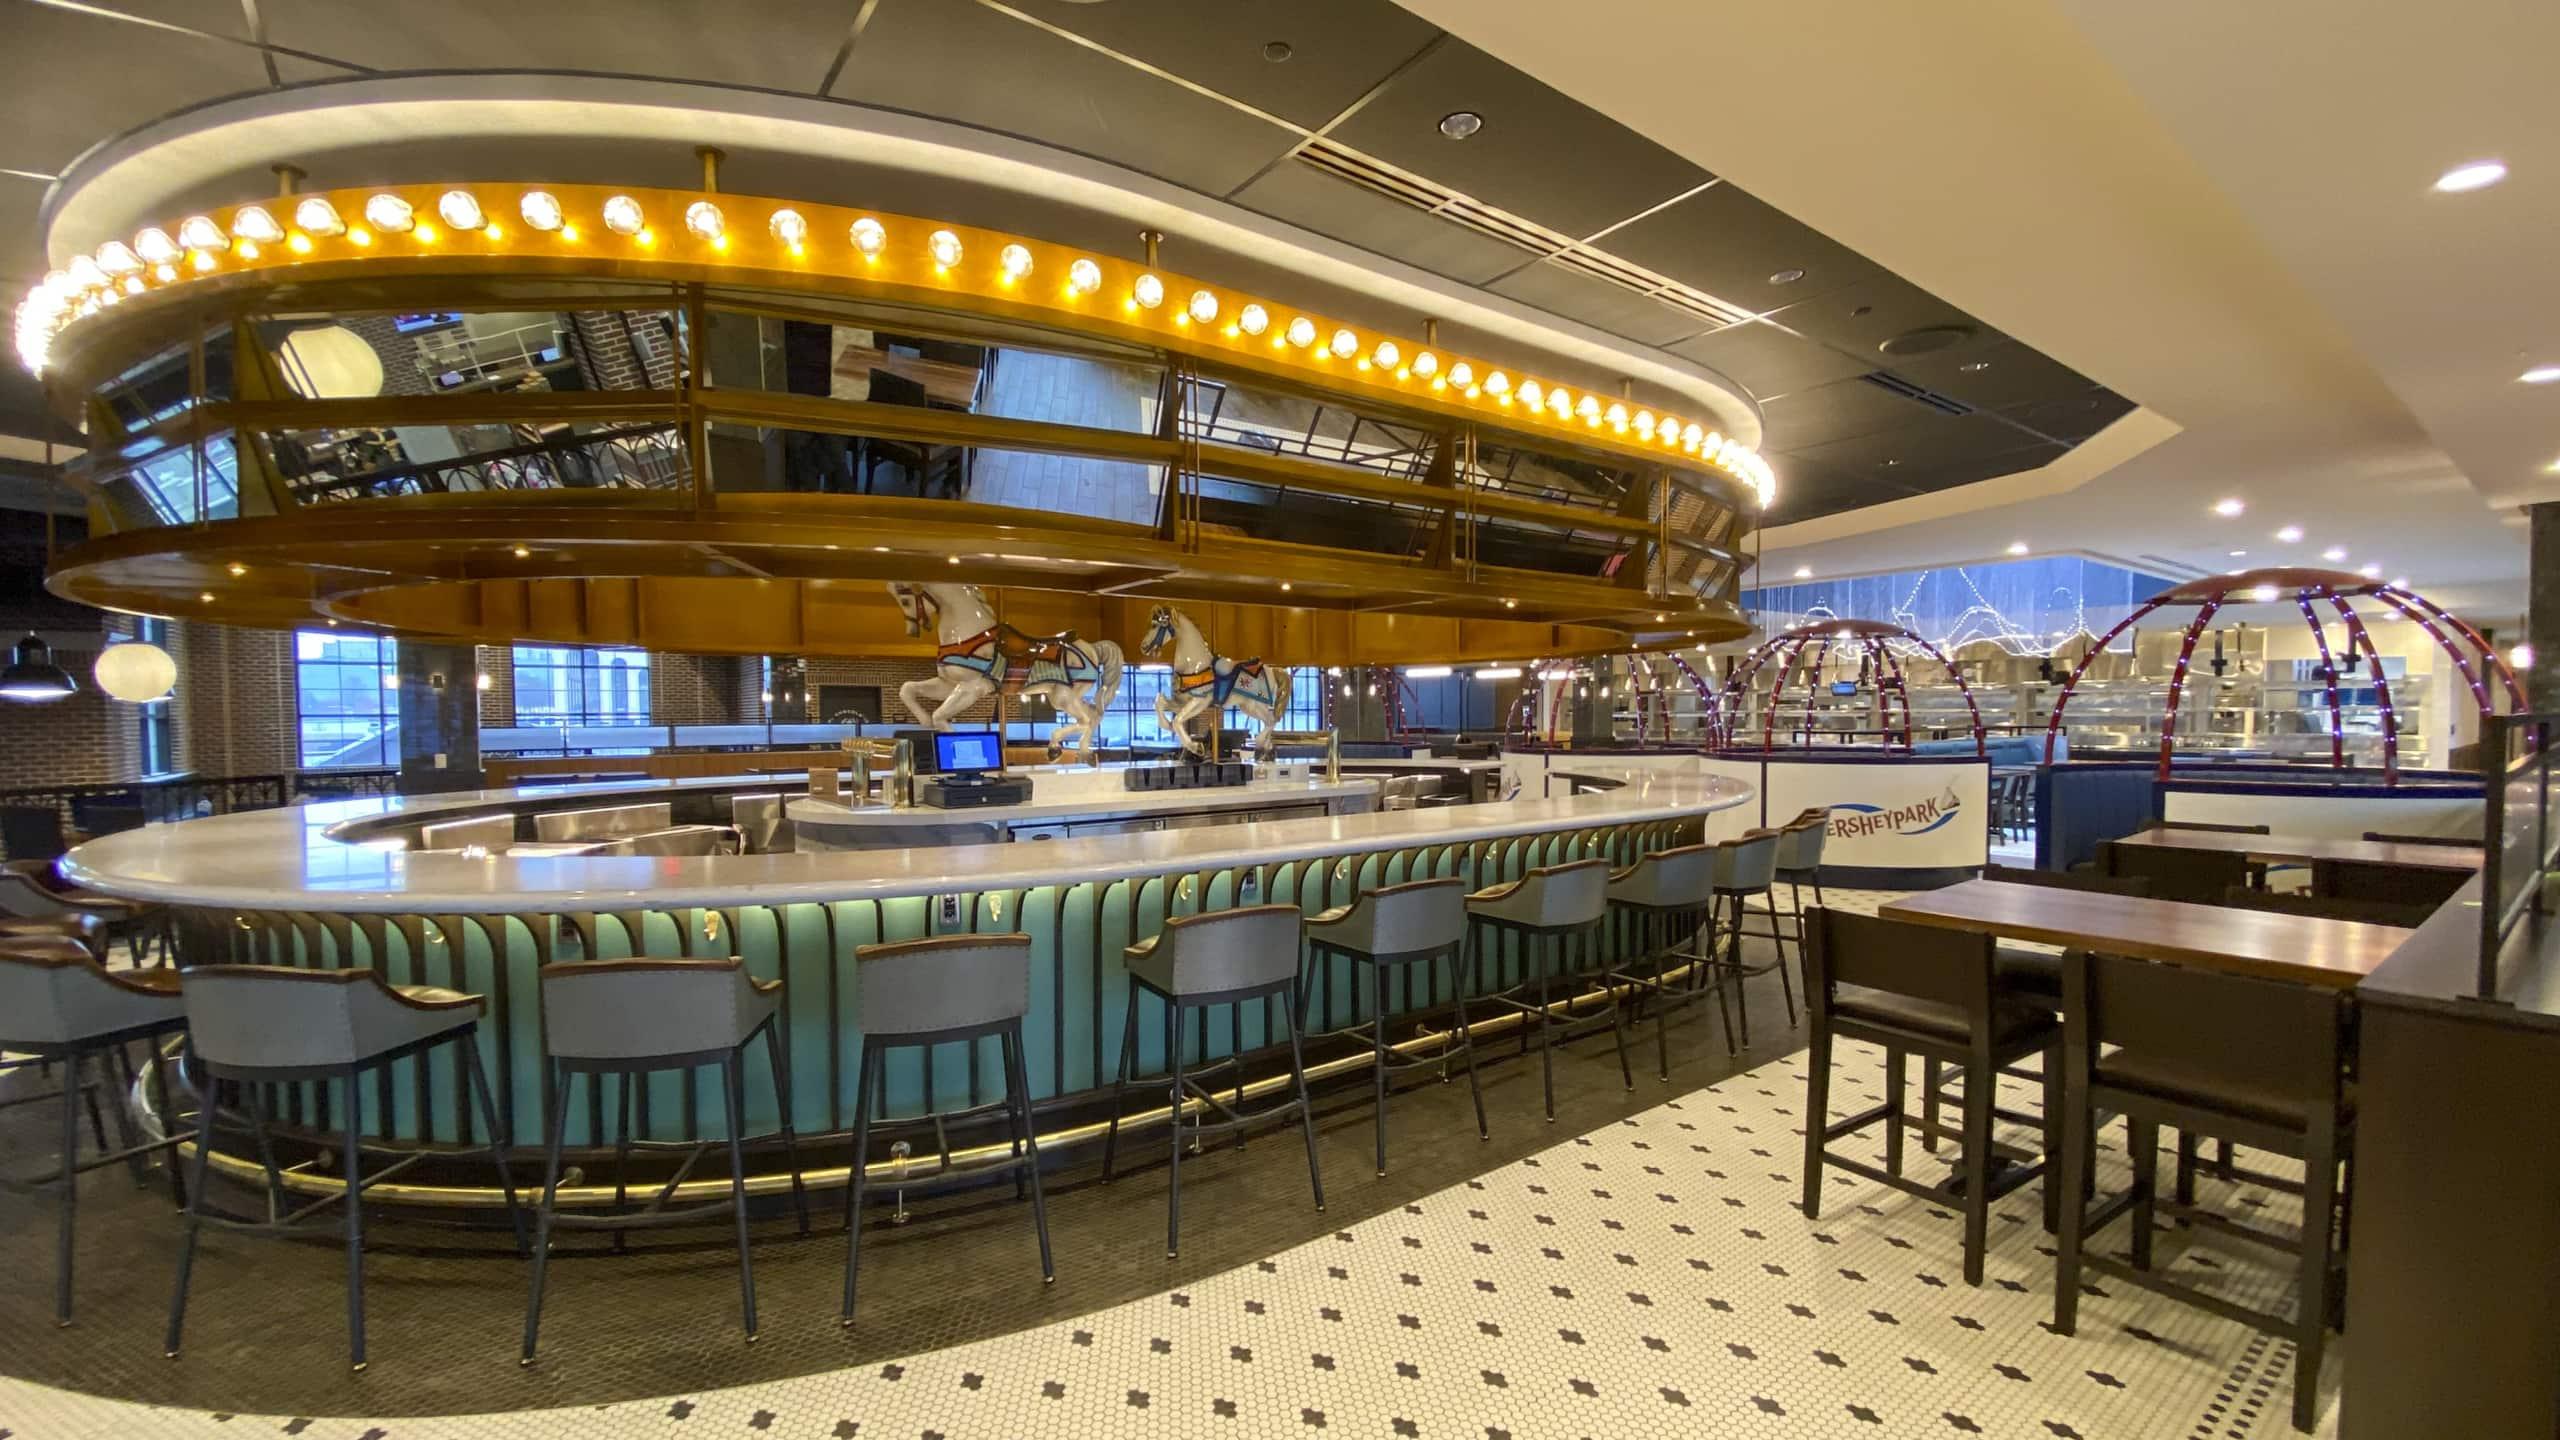 The Chocolatier Restaurant at Hersheypark